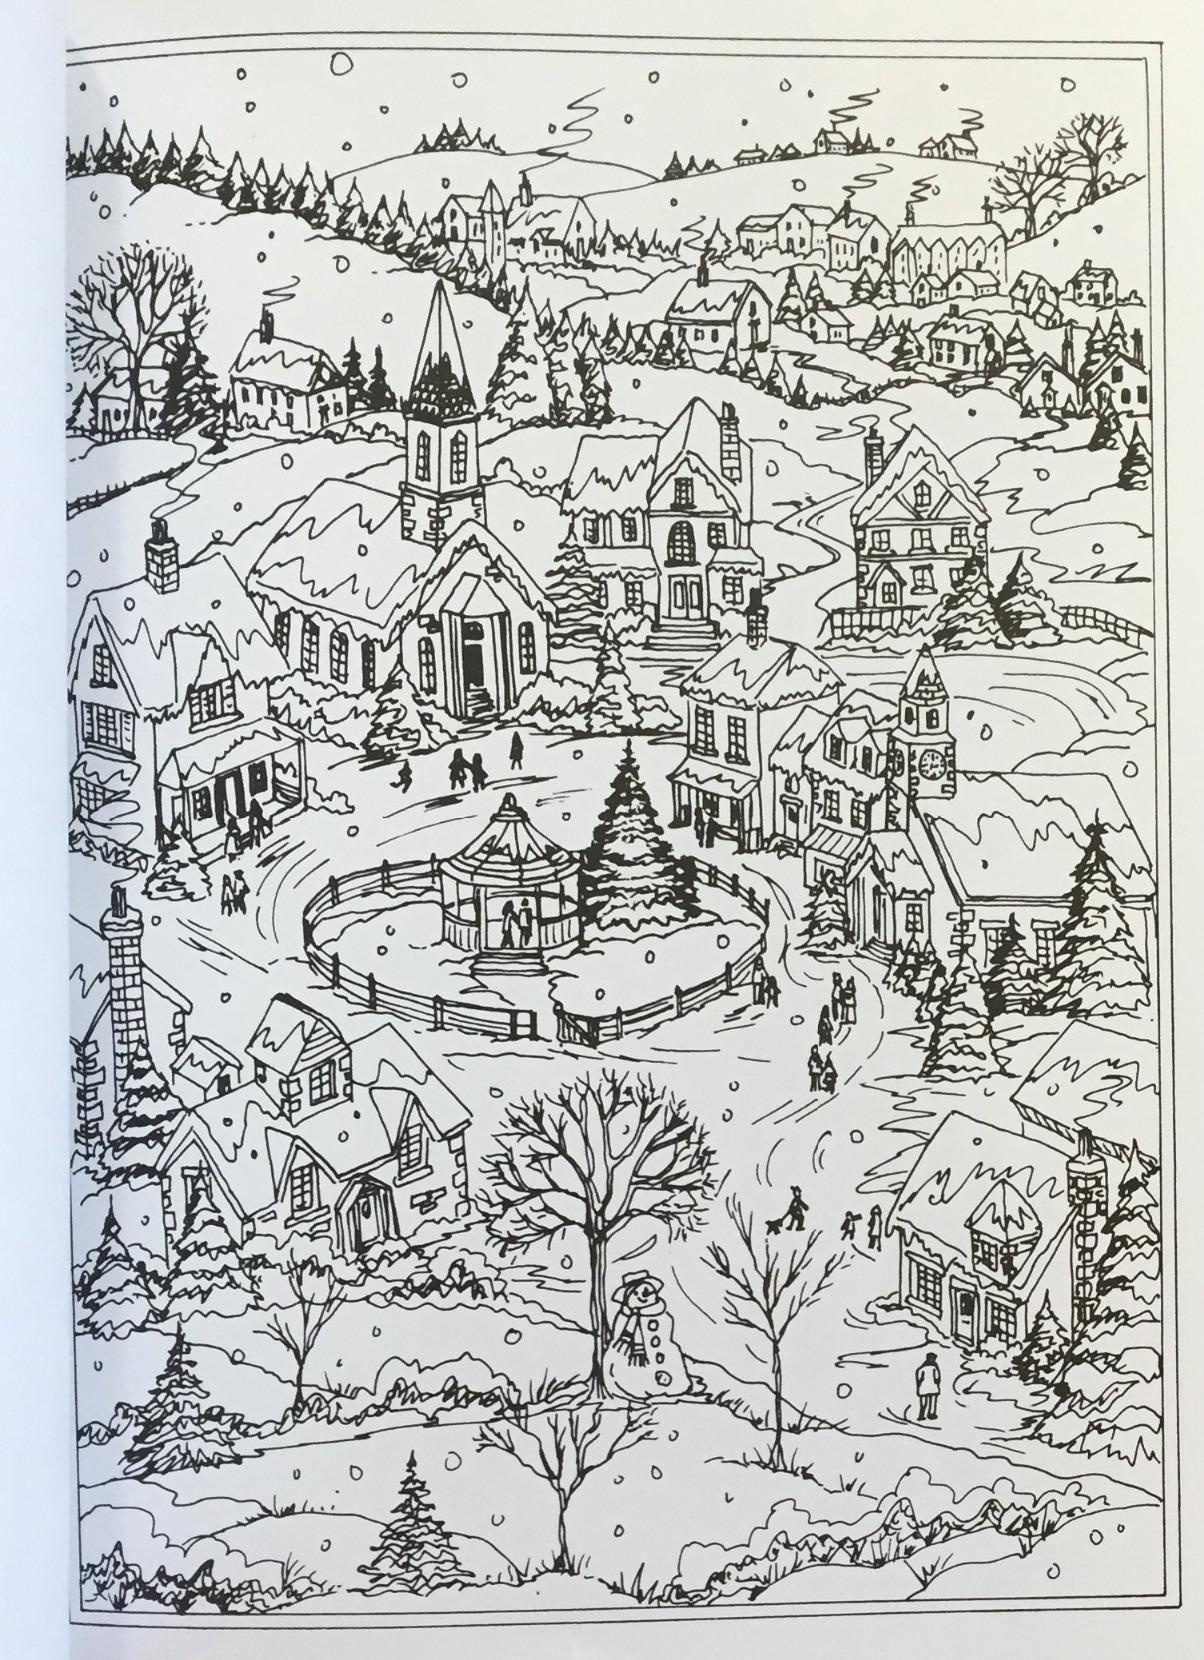 Amazoncom Creative Haven Winter Wonderland Coloring Book Adult